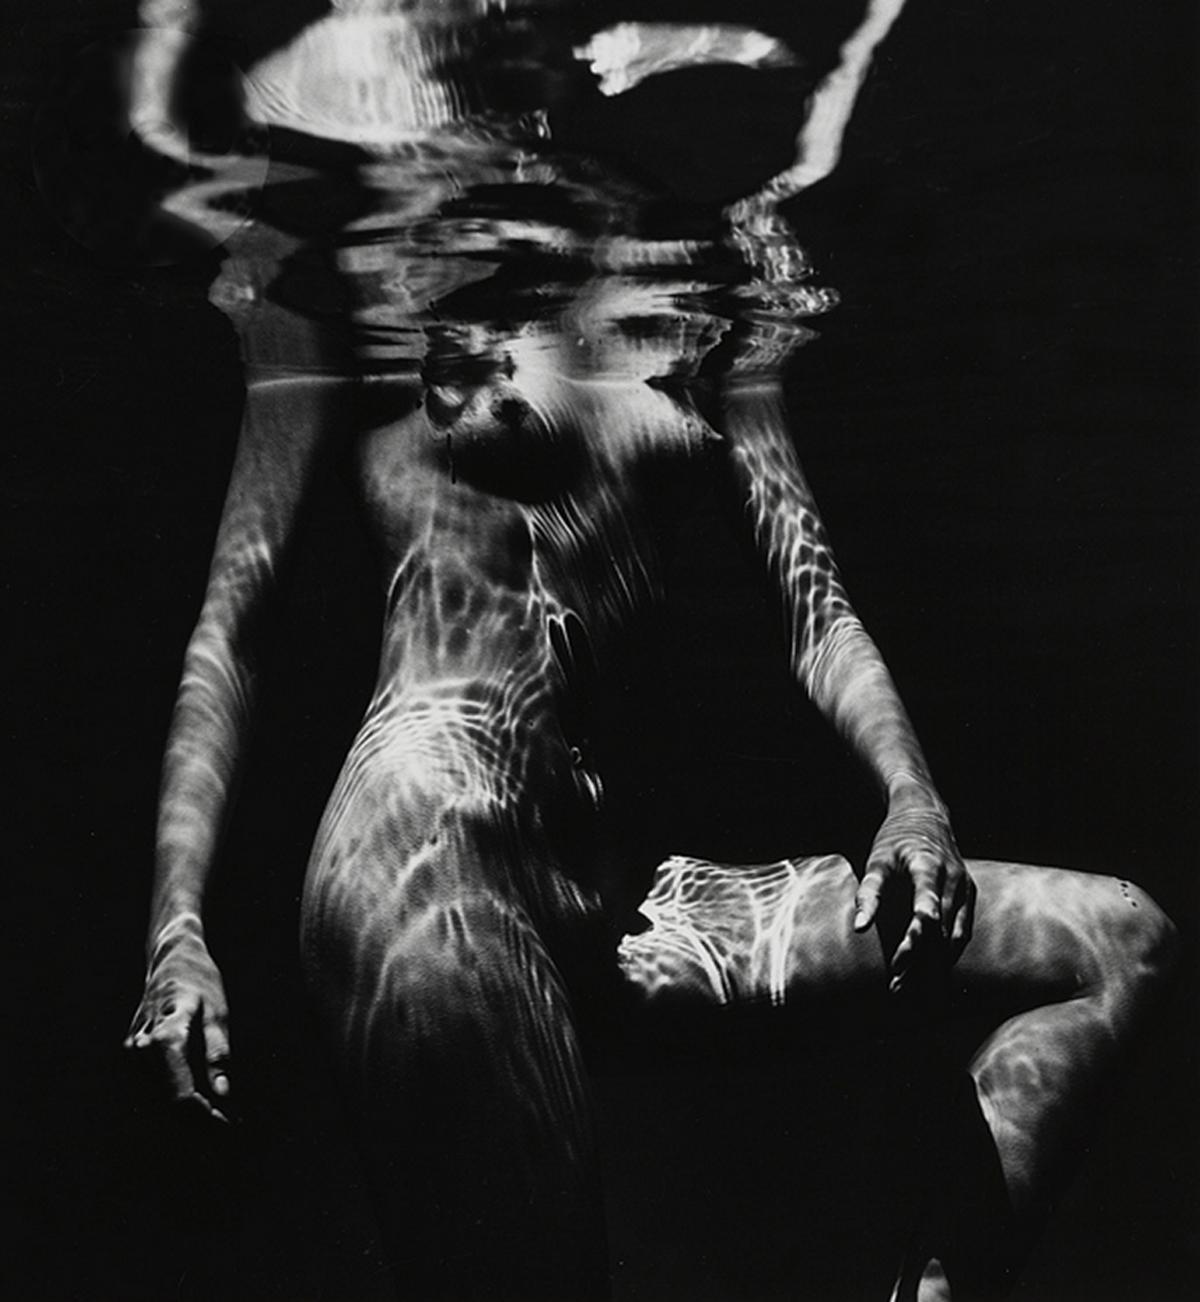 modern photography nudes jpg 1080x810